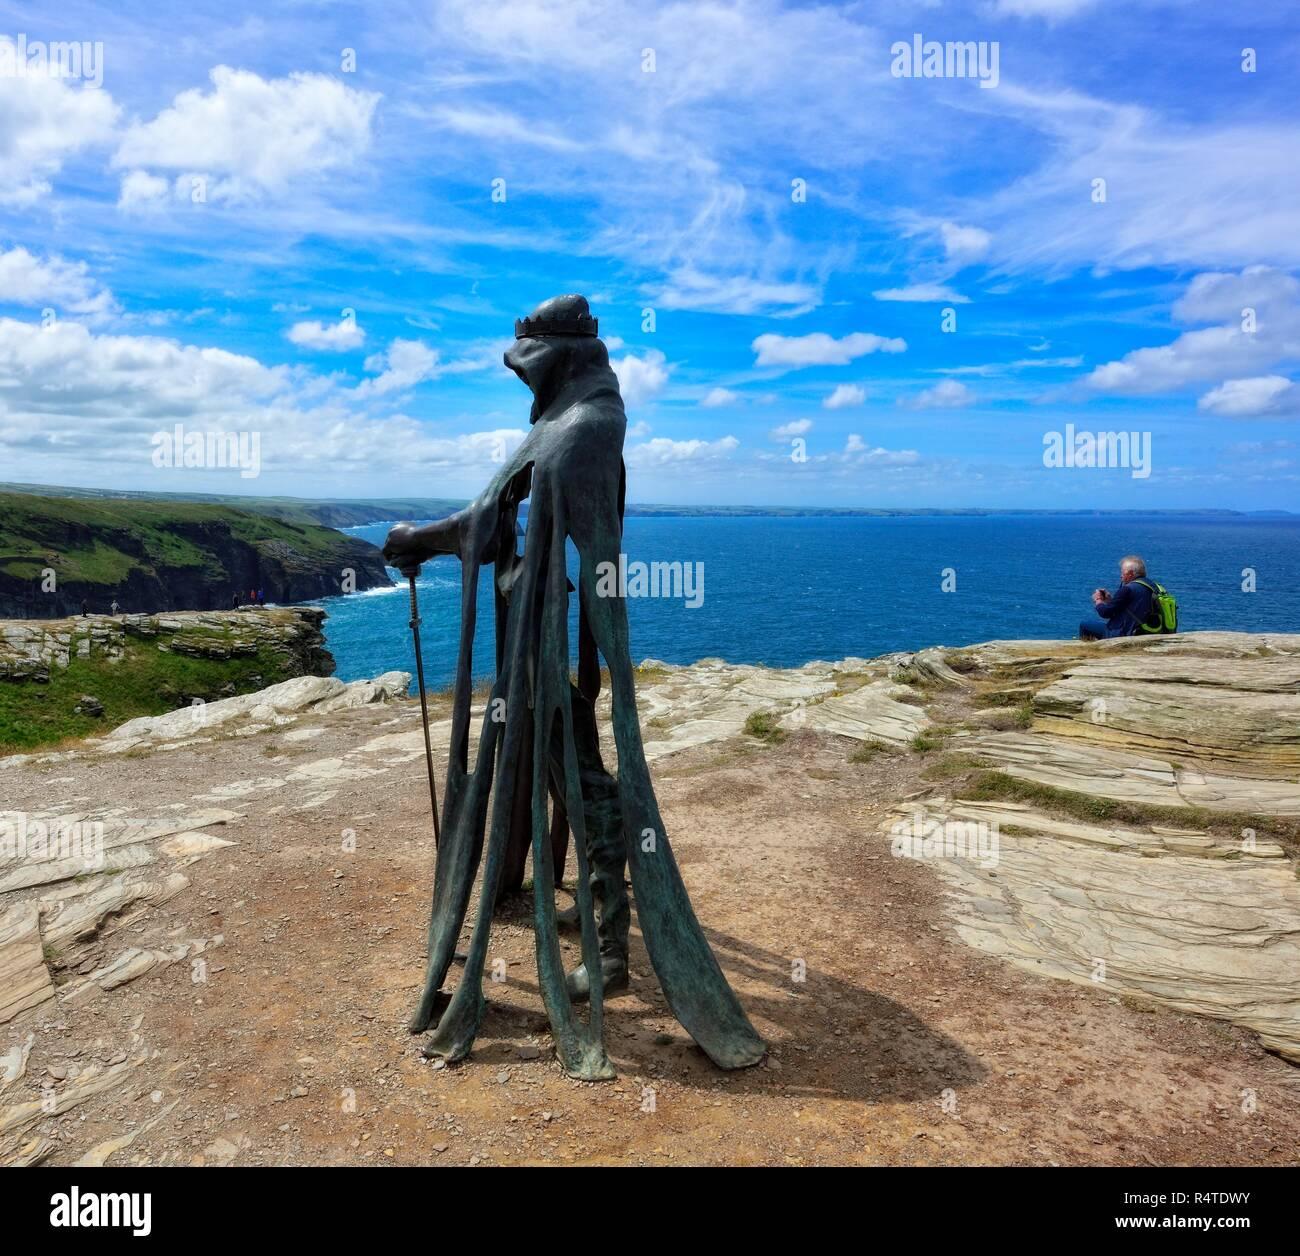 King Arthur Sculpture Stock Photos Amp King Arthur Sculpture